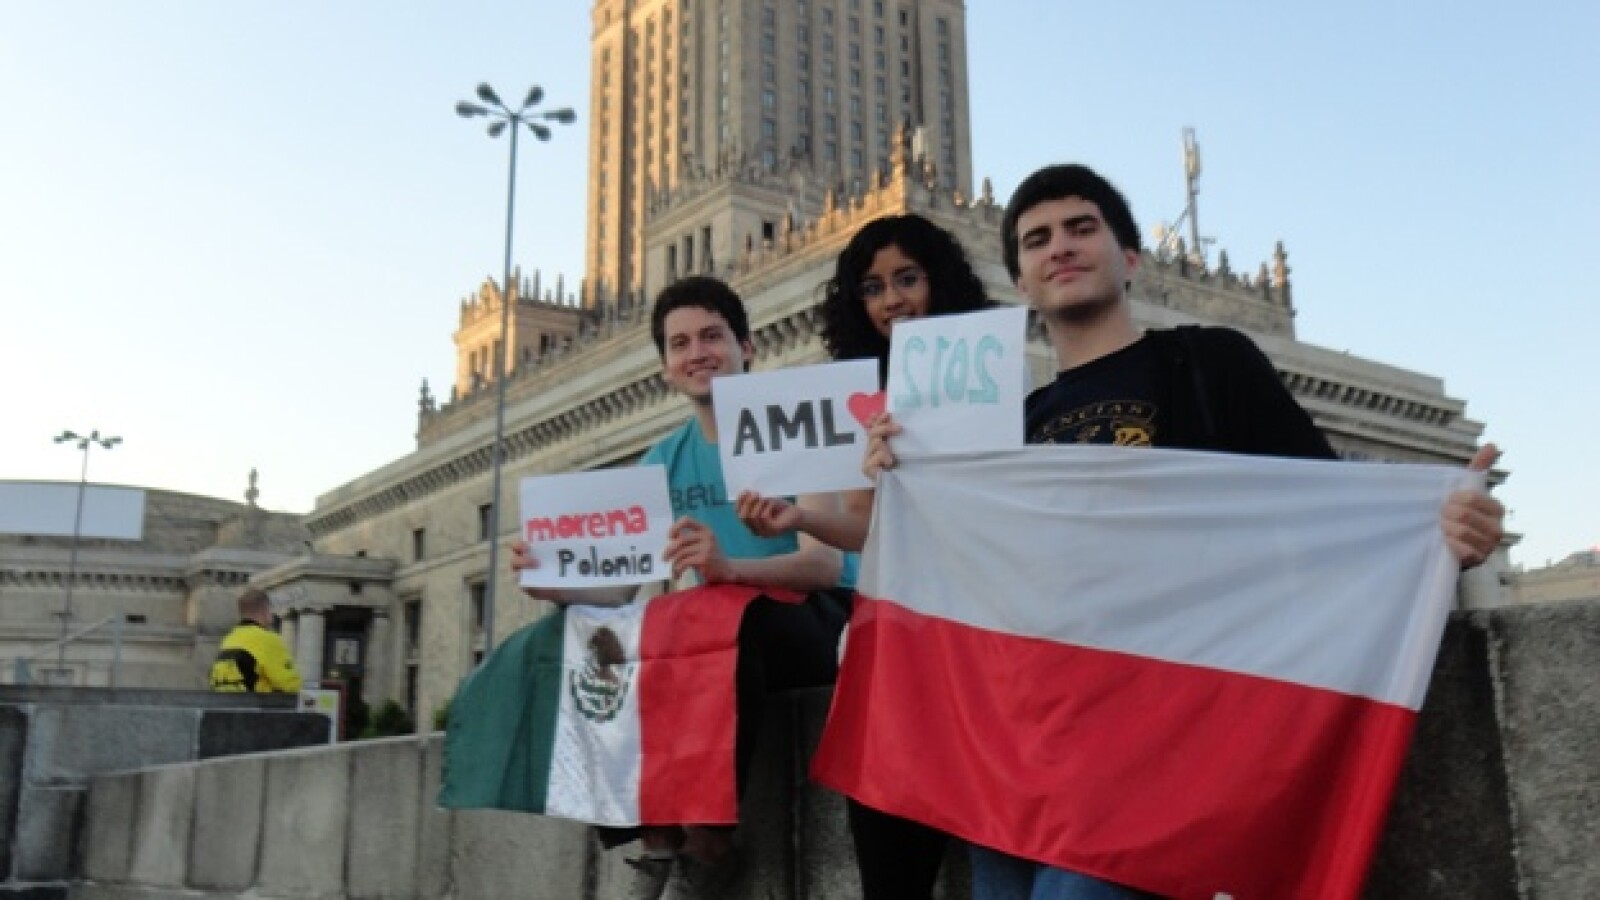 Marcha AMLO Polonia